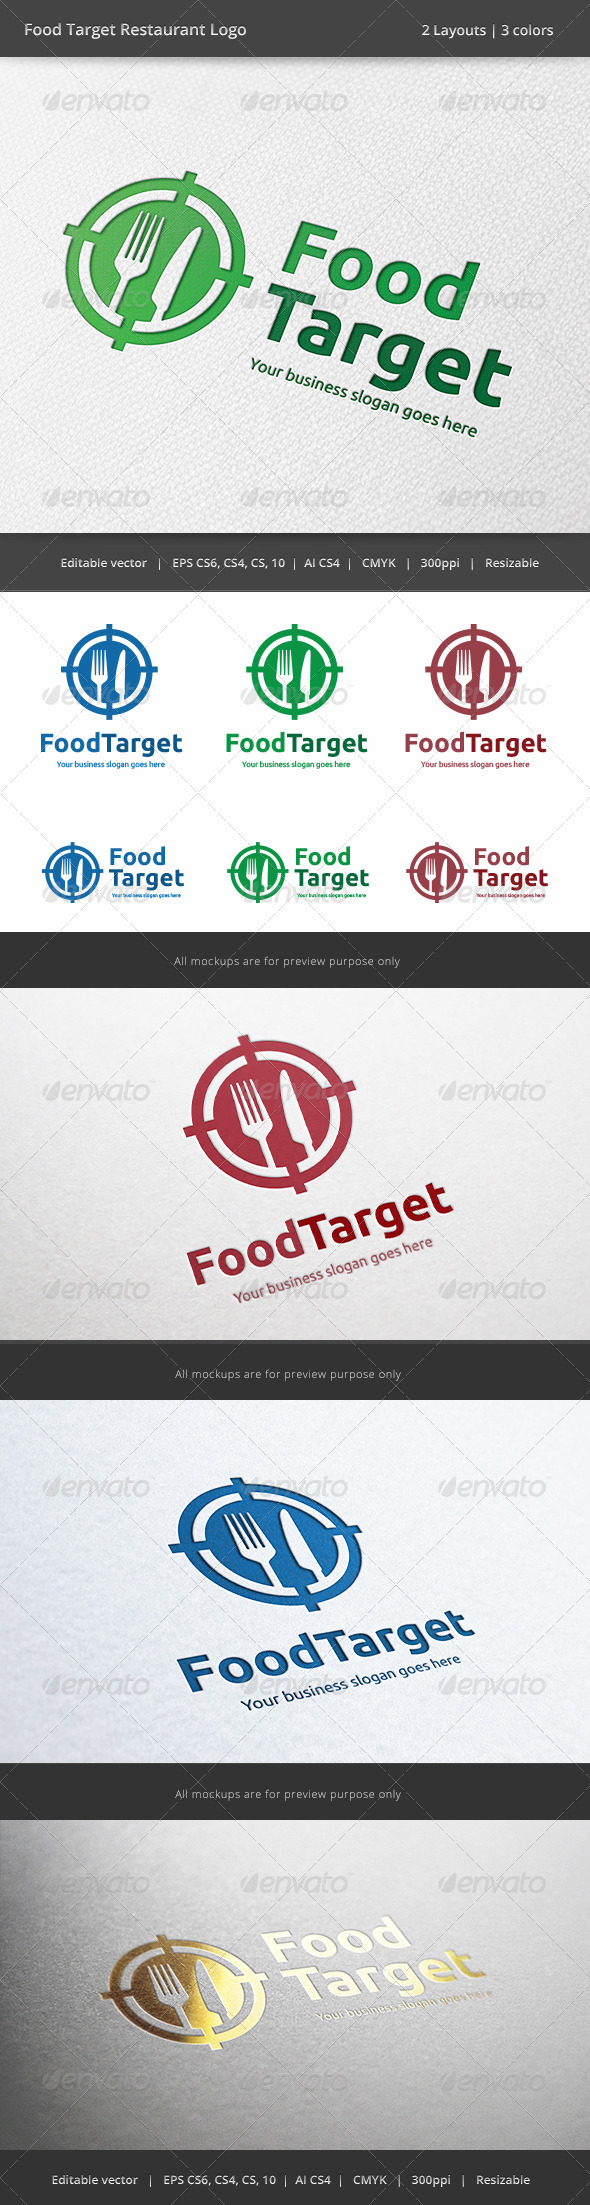 Food Target Restaurant Logo